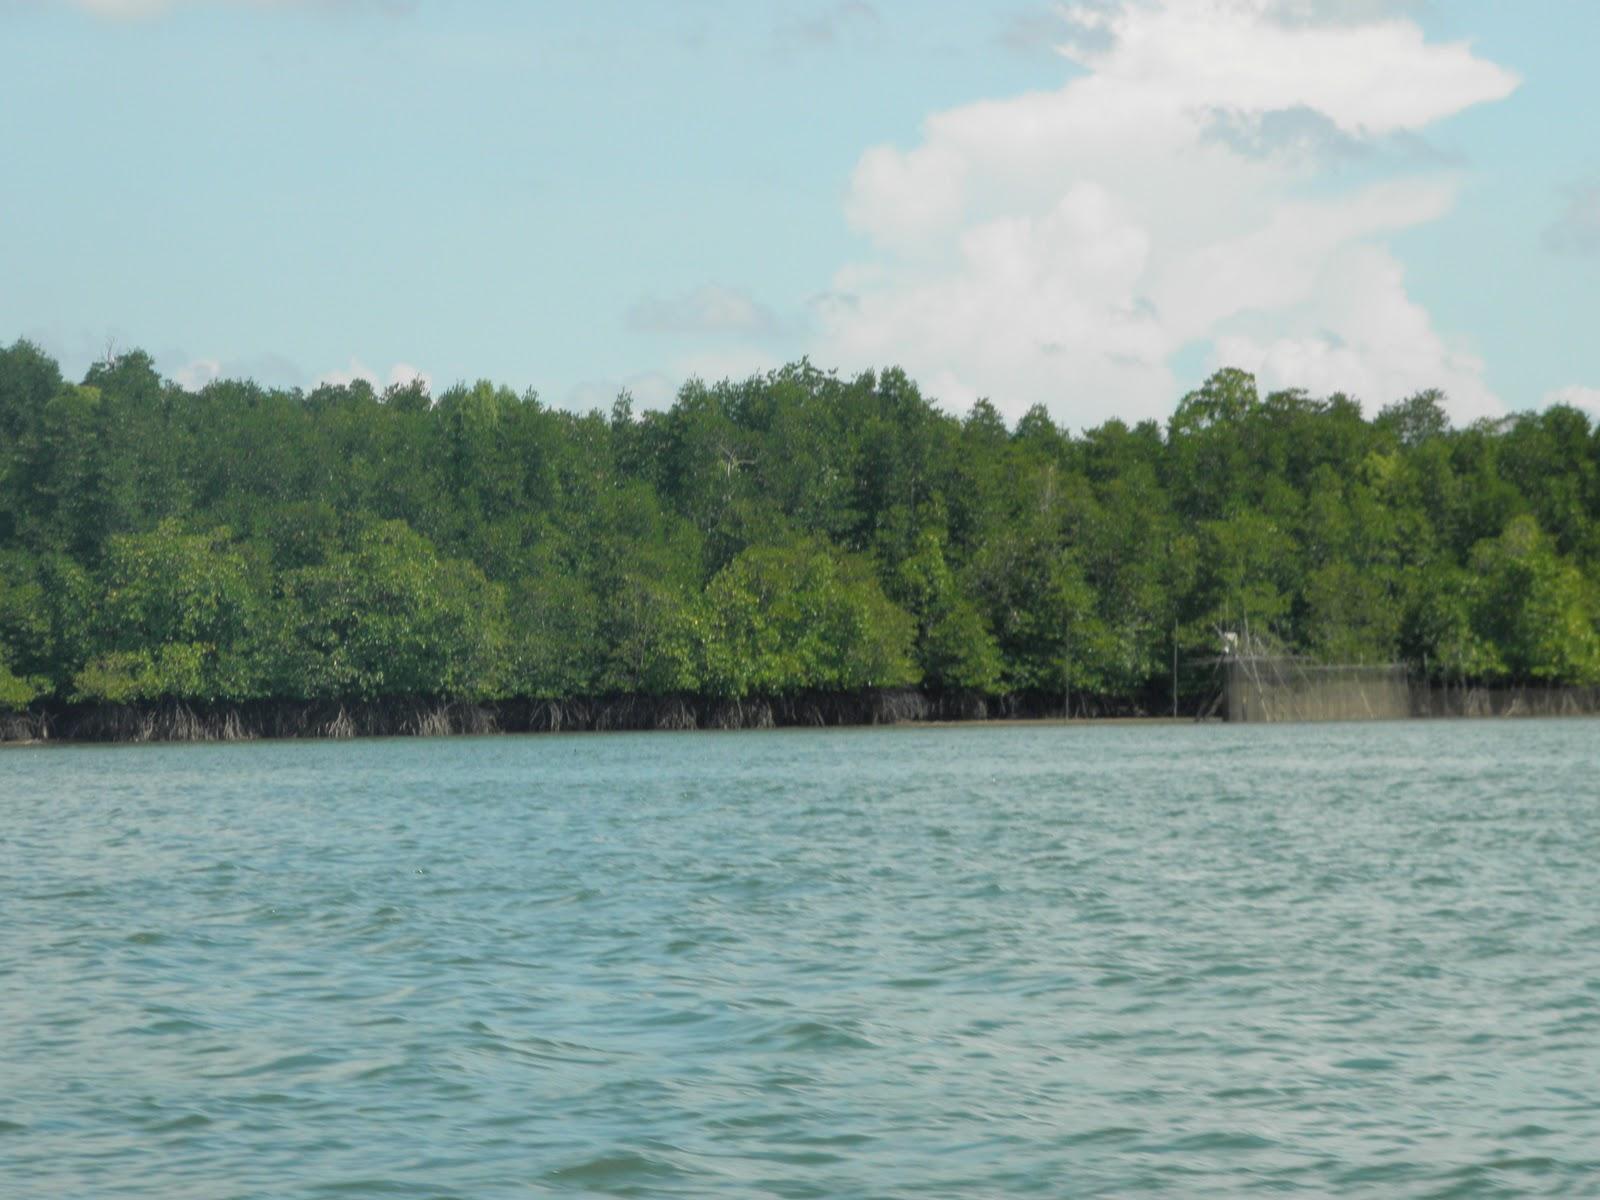 Dammayanti Utami Bastian: Permasalahan Dalam Hutan Mangrove Di Kalimantan Timur